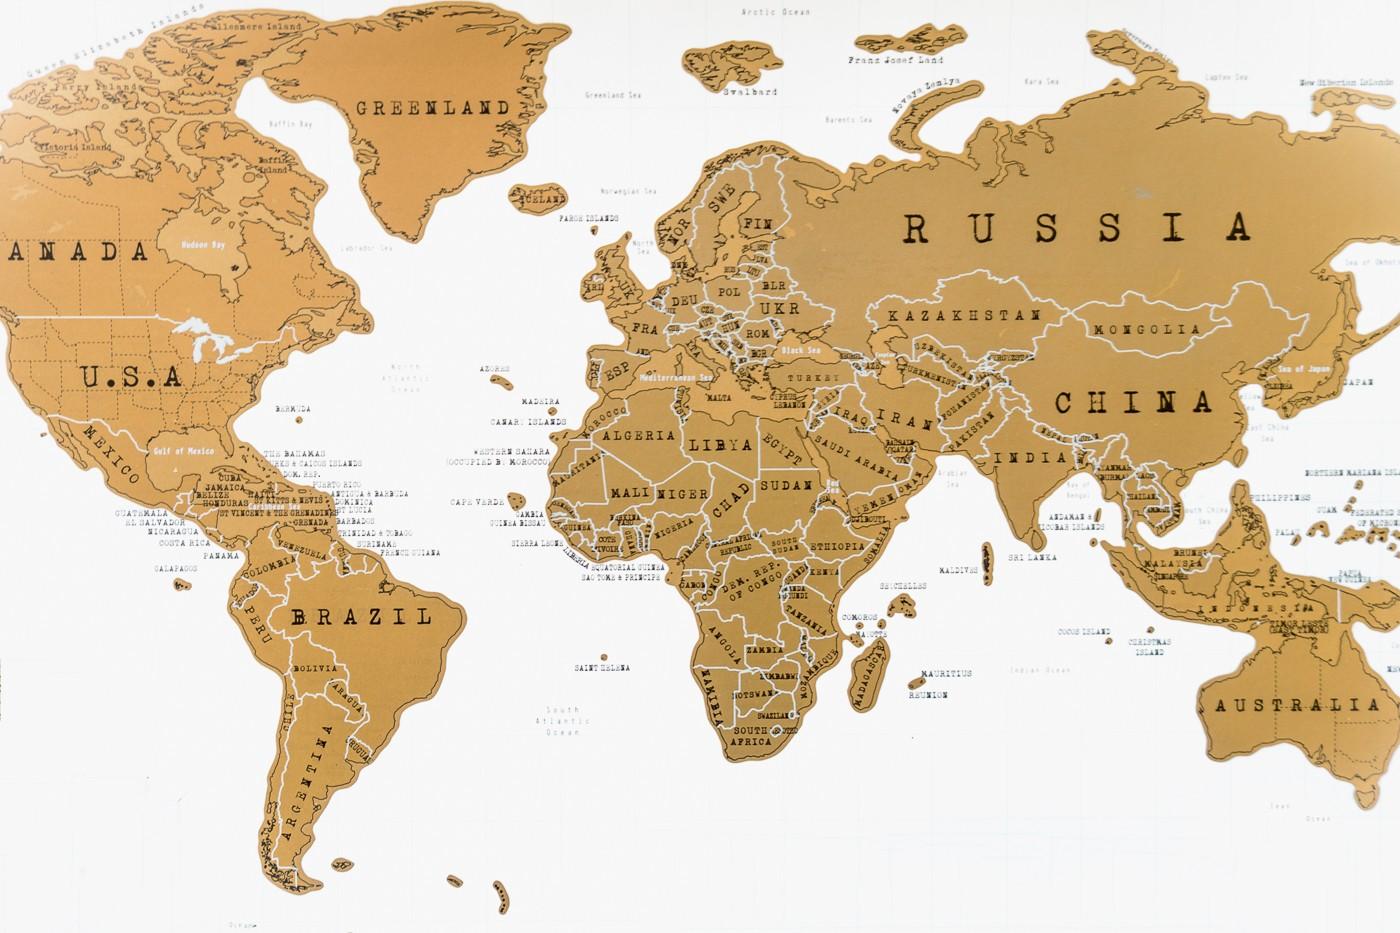 World map - gold